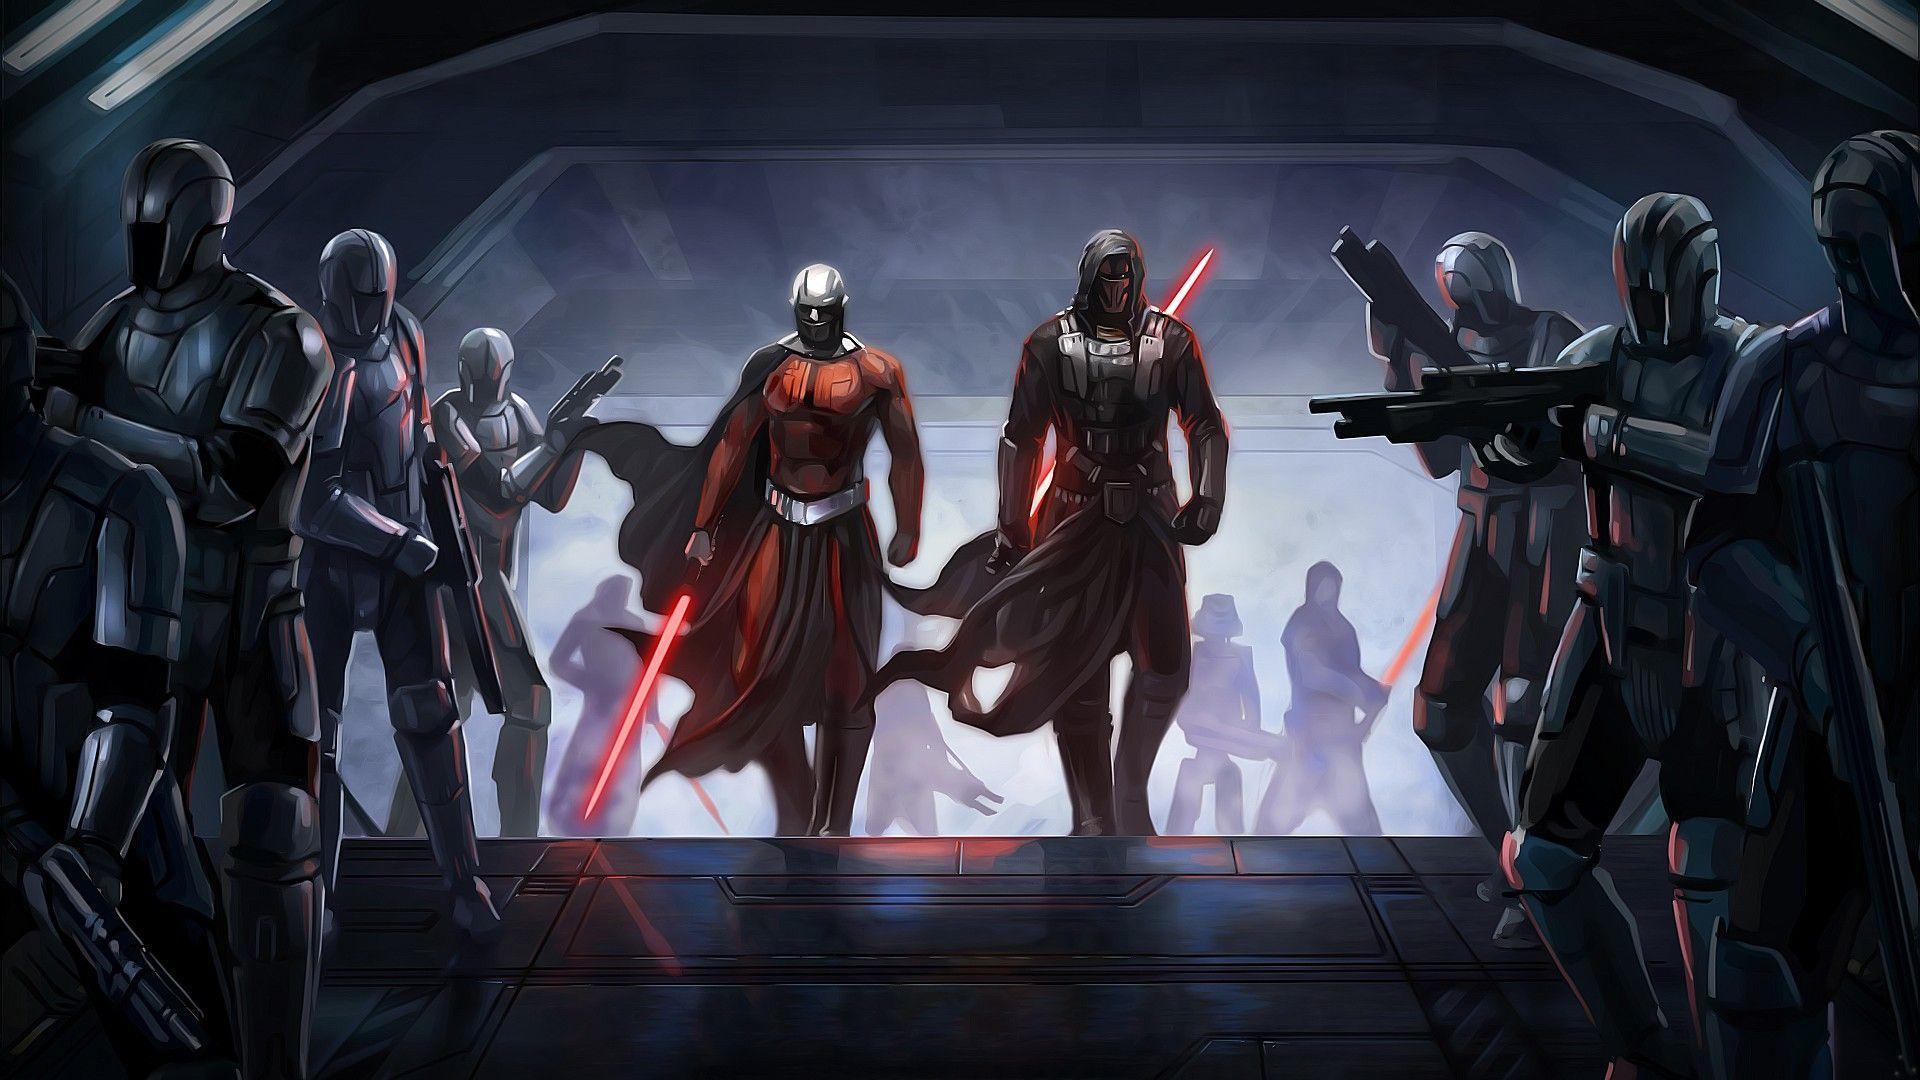 epic star wars trooper wallpaper - photo #17